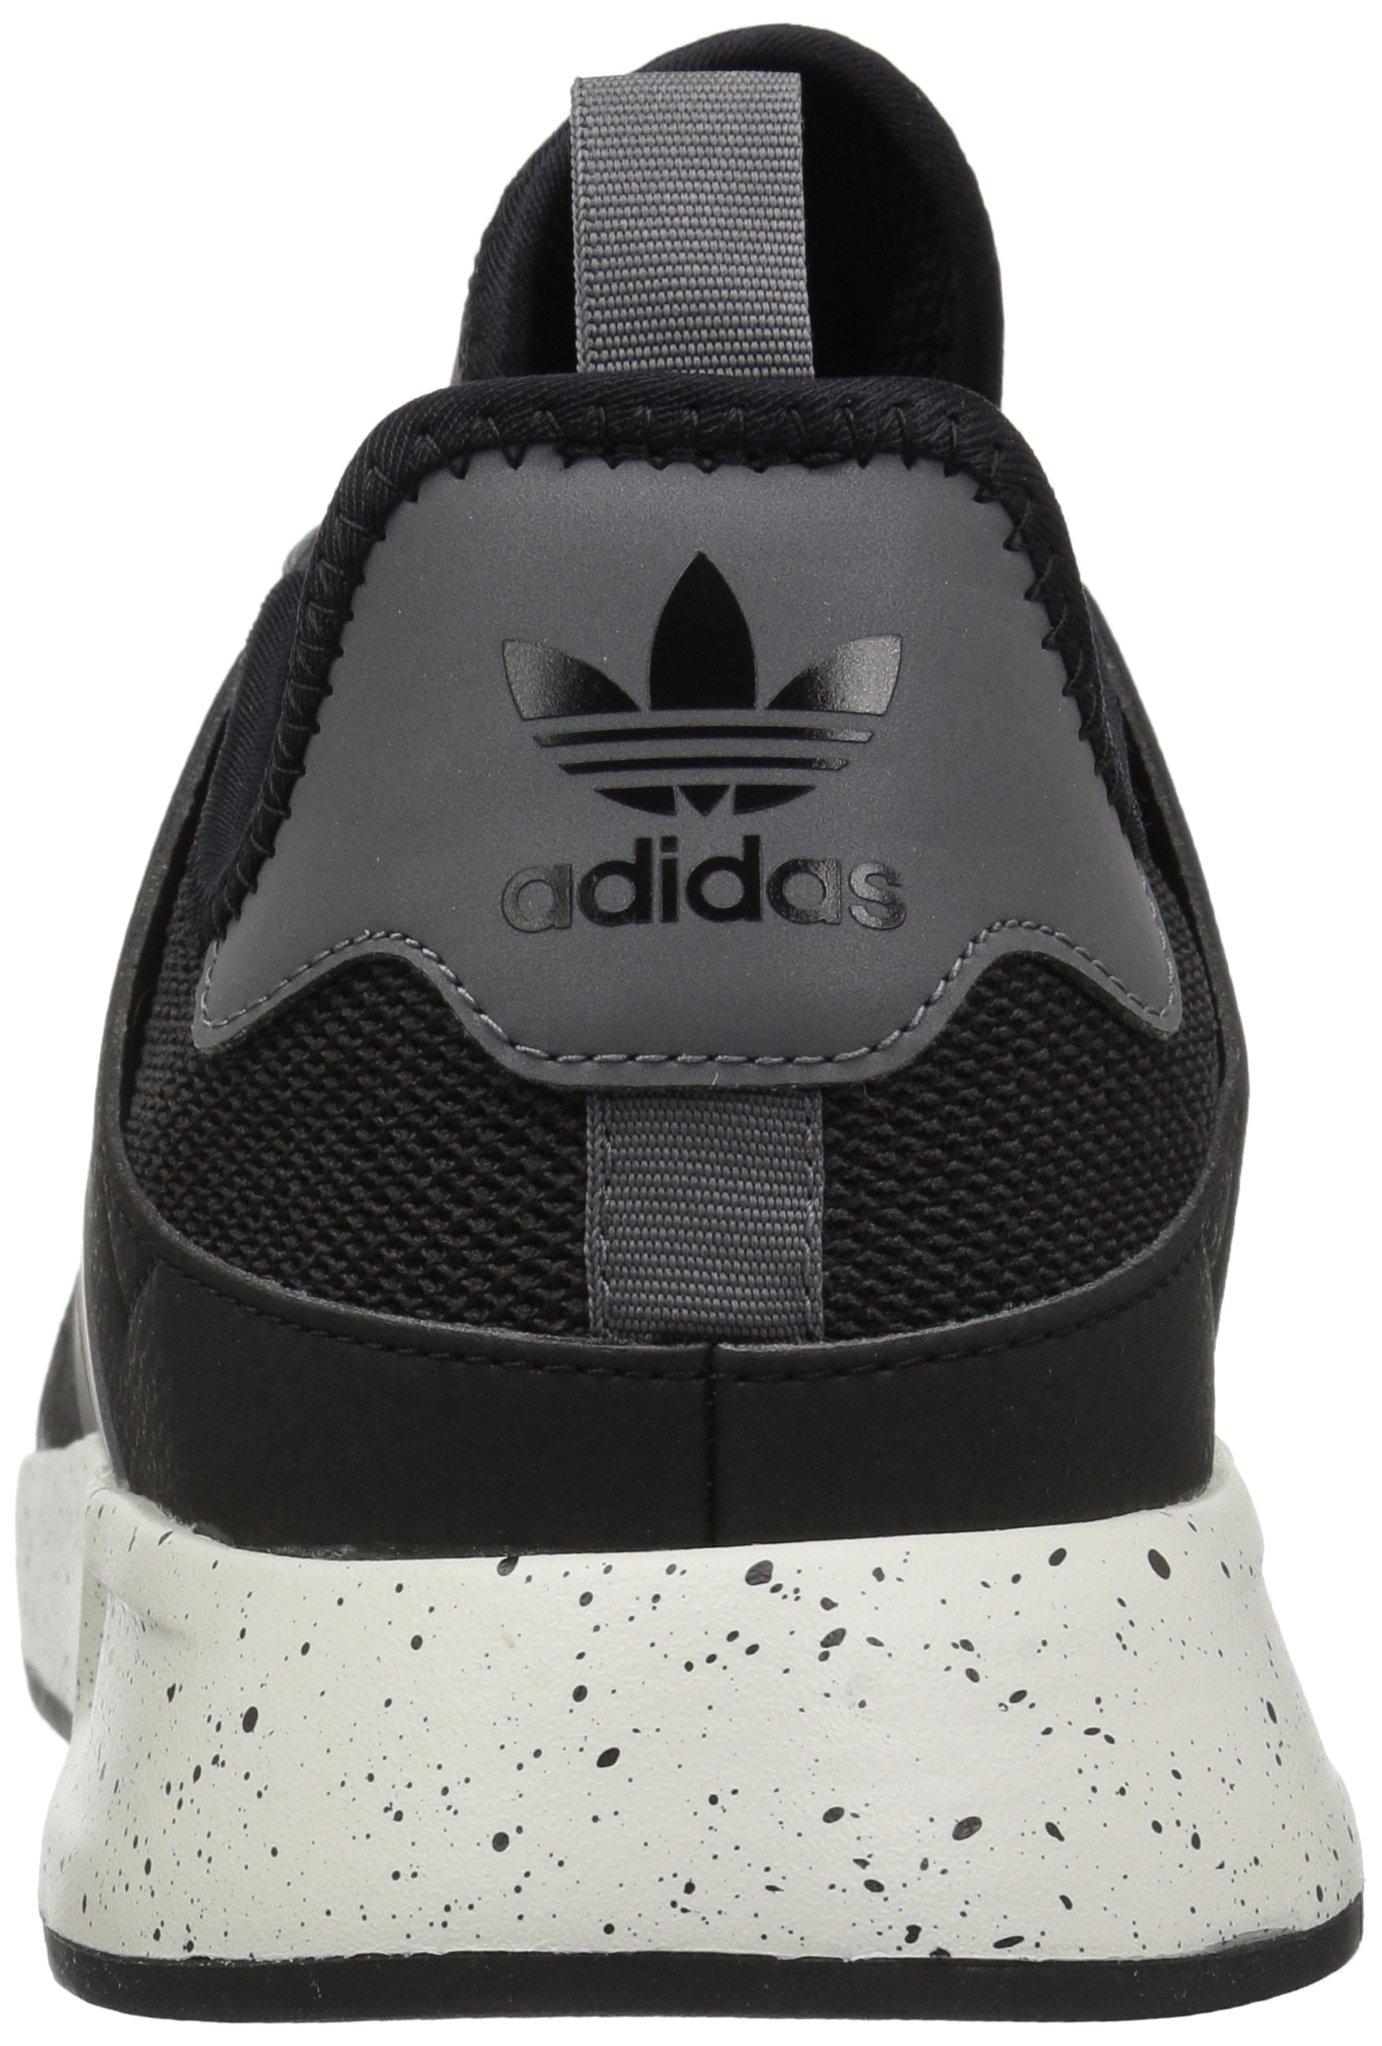 adidas Originals Mens X_PLR Running Shoe Sneaker Grey/Black, 4.5 M US by adidas Originals (Image #2)